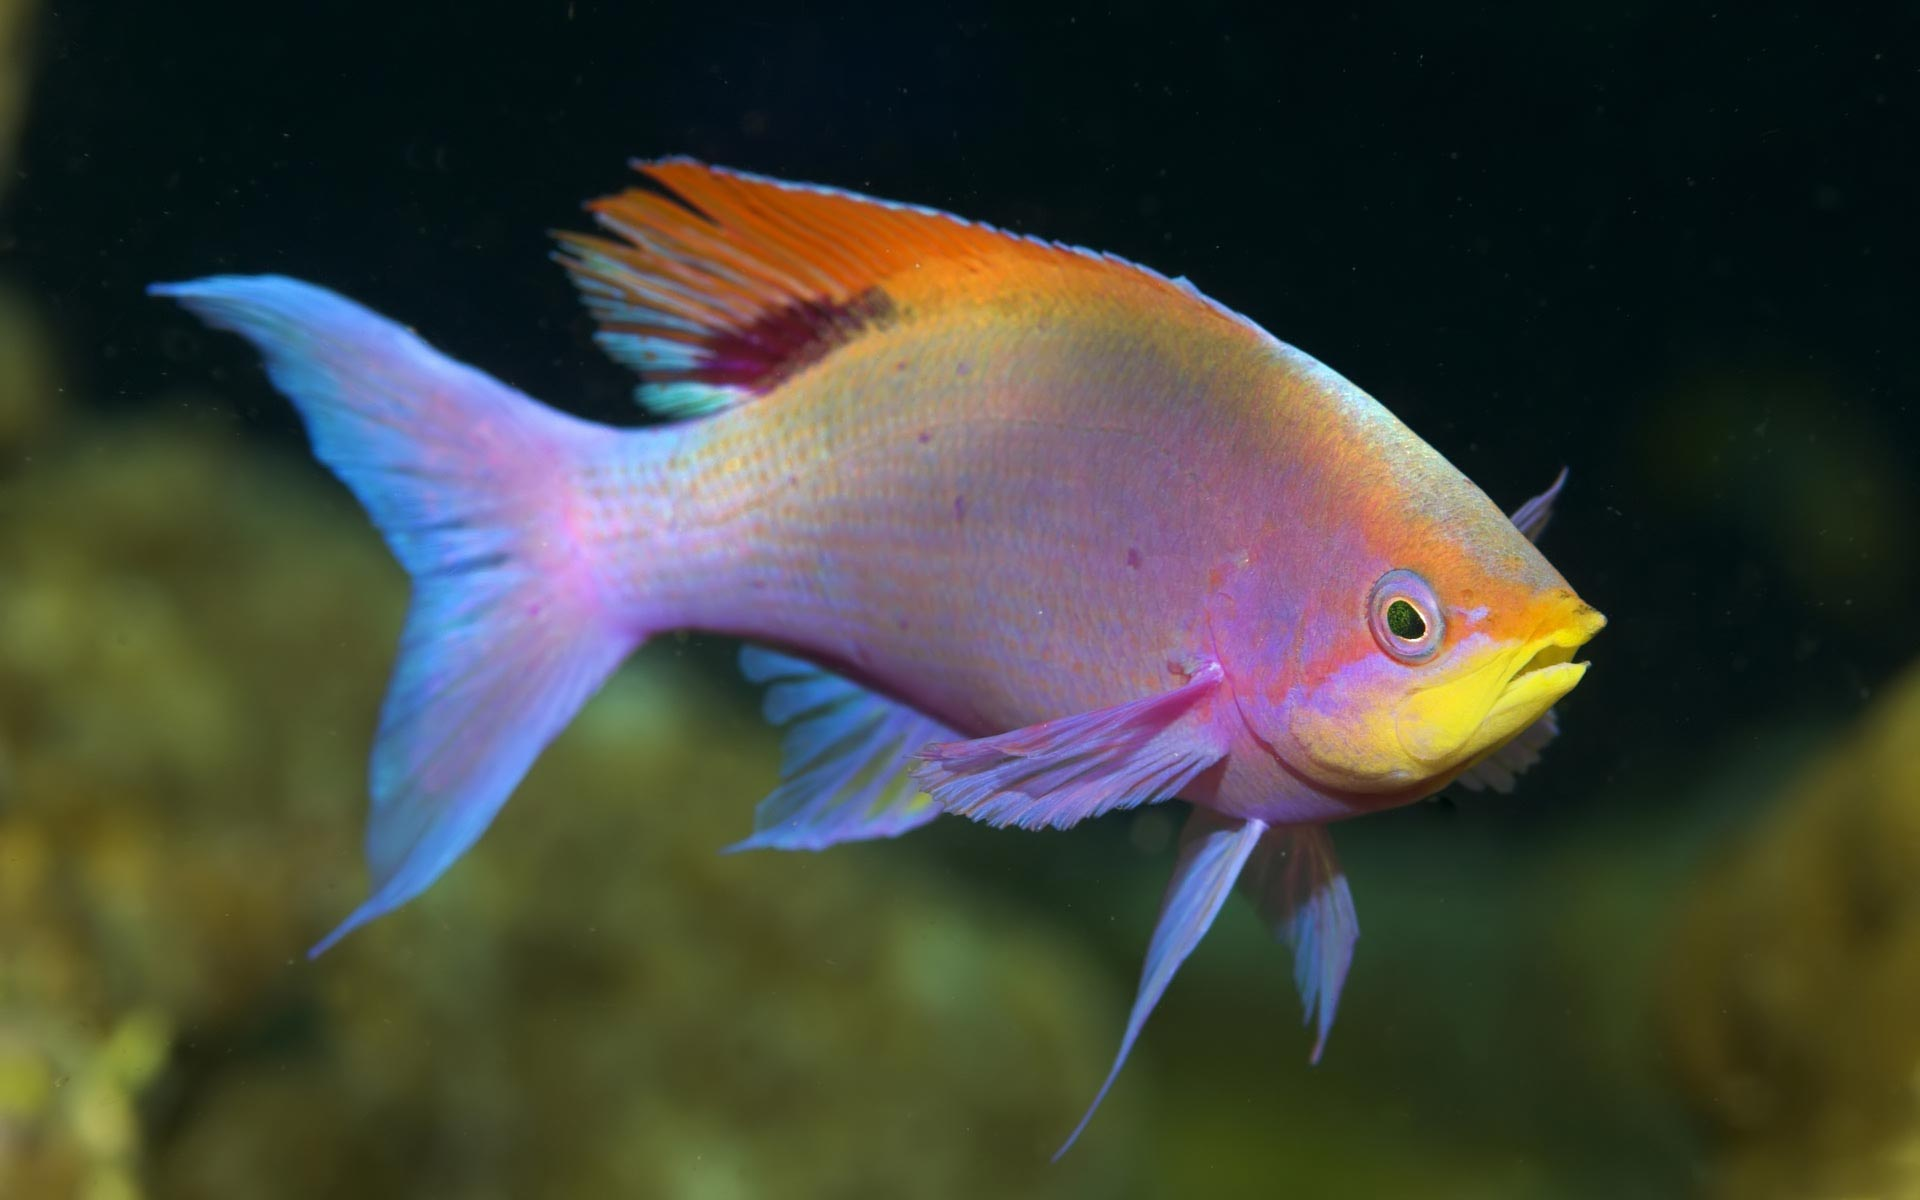 Freshwater aquarium fish uk - Freshwater Fish Pictures 13292 Hd Wallpapers In Animals Imagesci Com